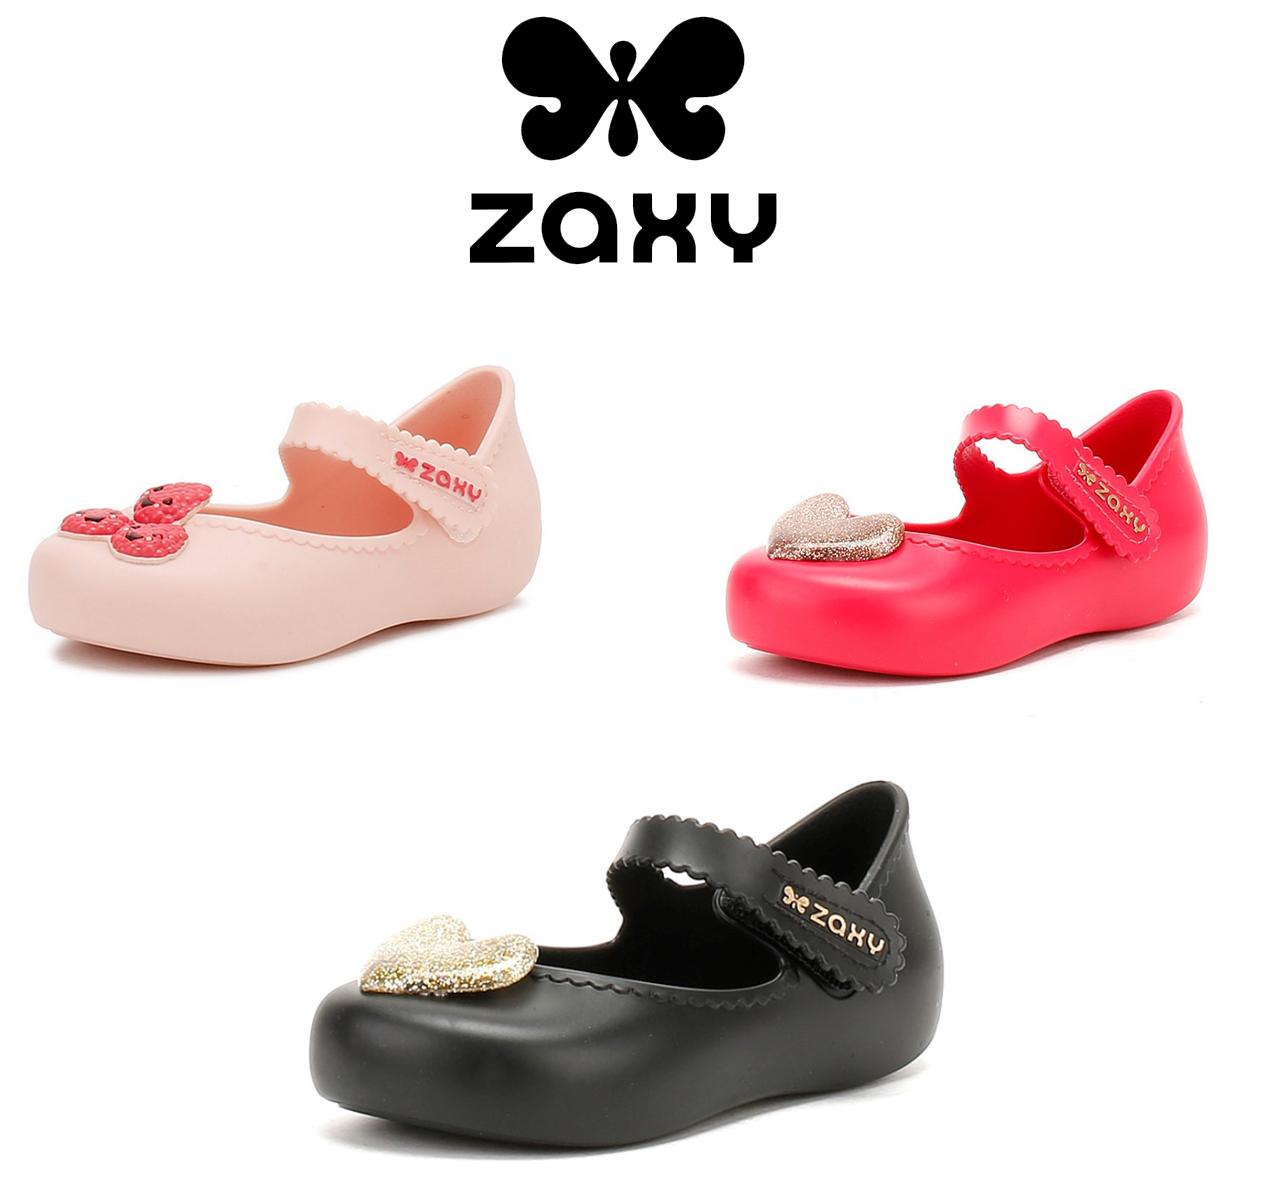 1740c6efb1a5 Details about Zaxy Infants Glitter Heart Ballerina Pumps, Kids PVC Shoes  Black or Pink